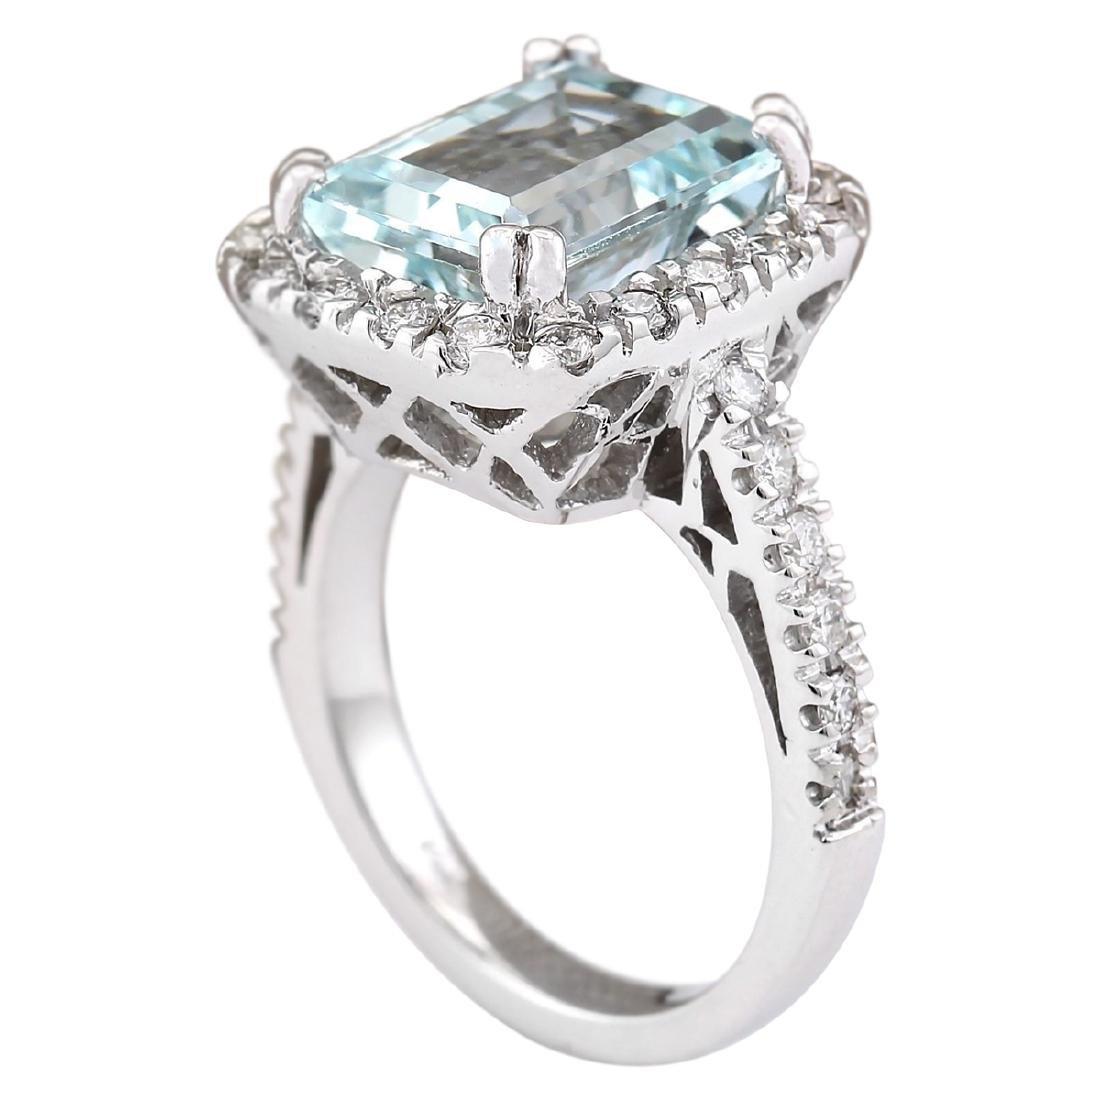 5.63 CTW Natural Aquamarine And Diamond Ring In 18K - 3